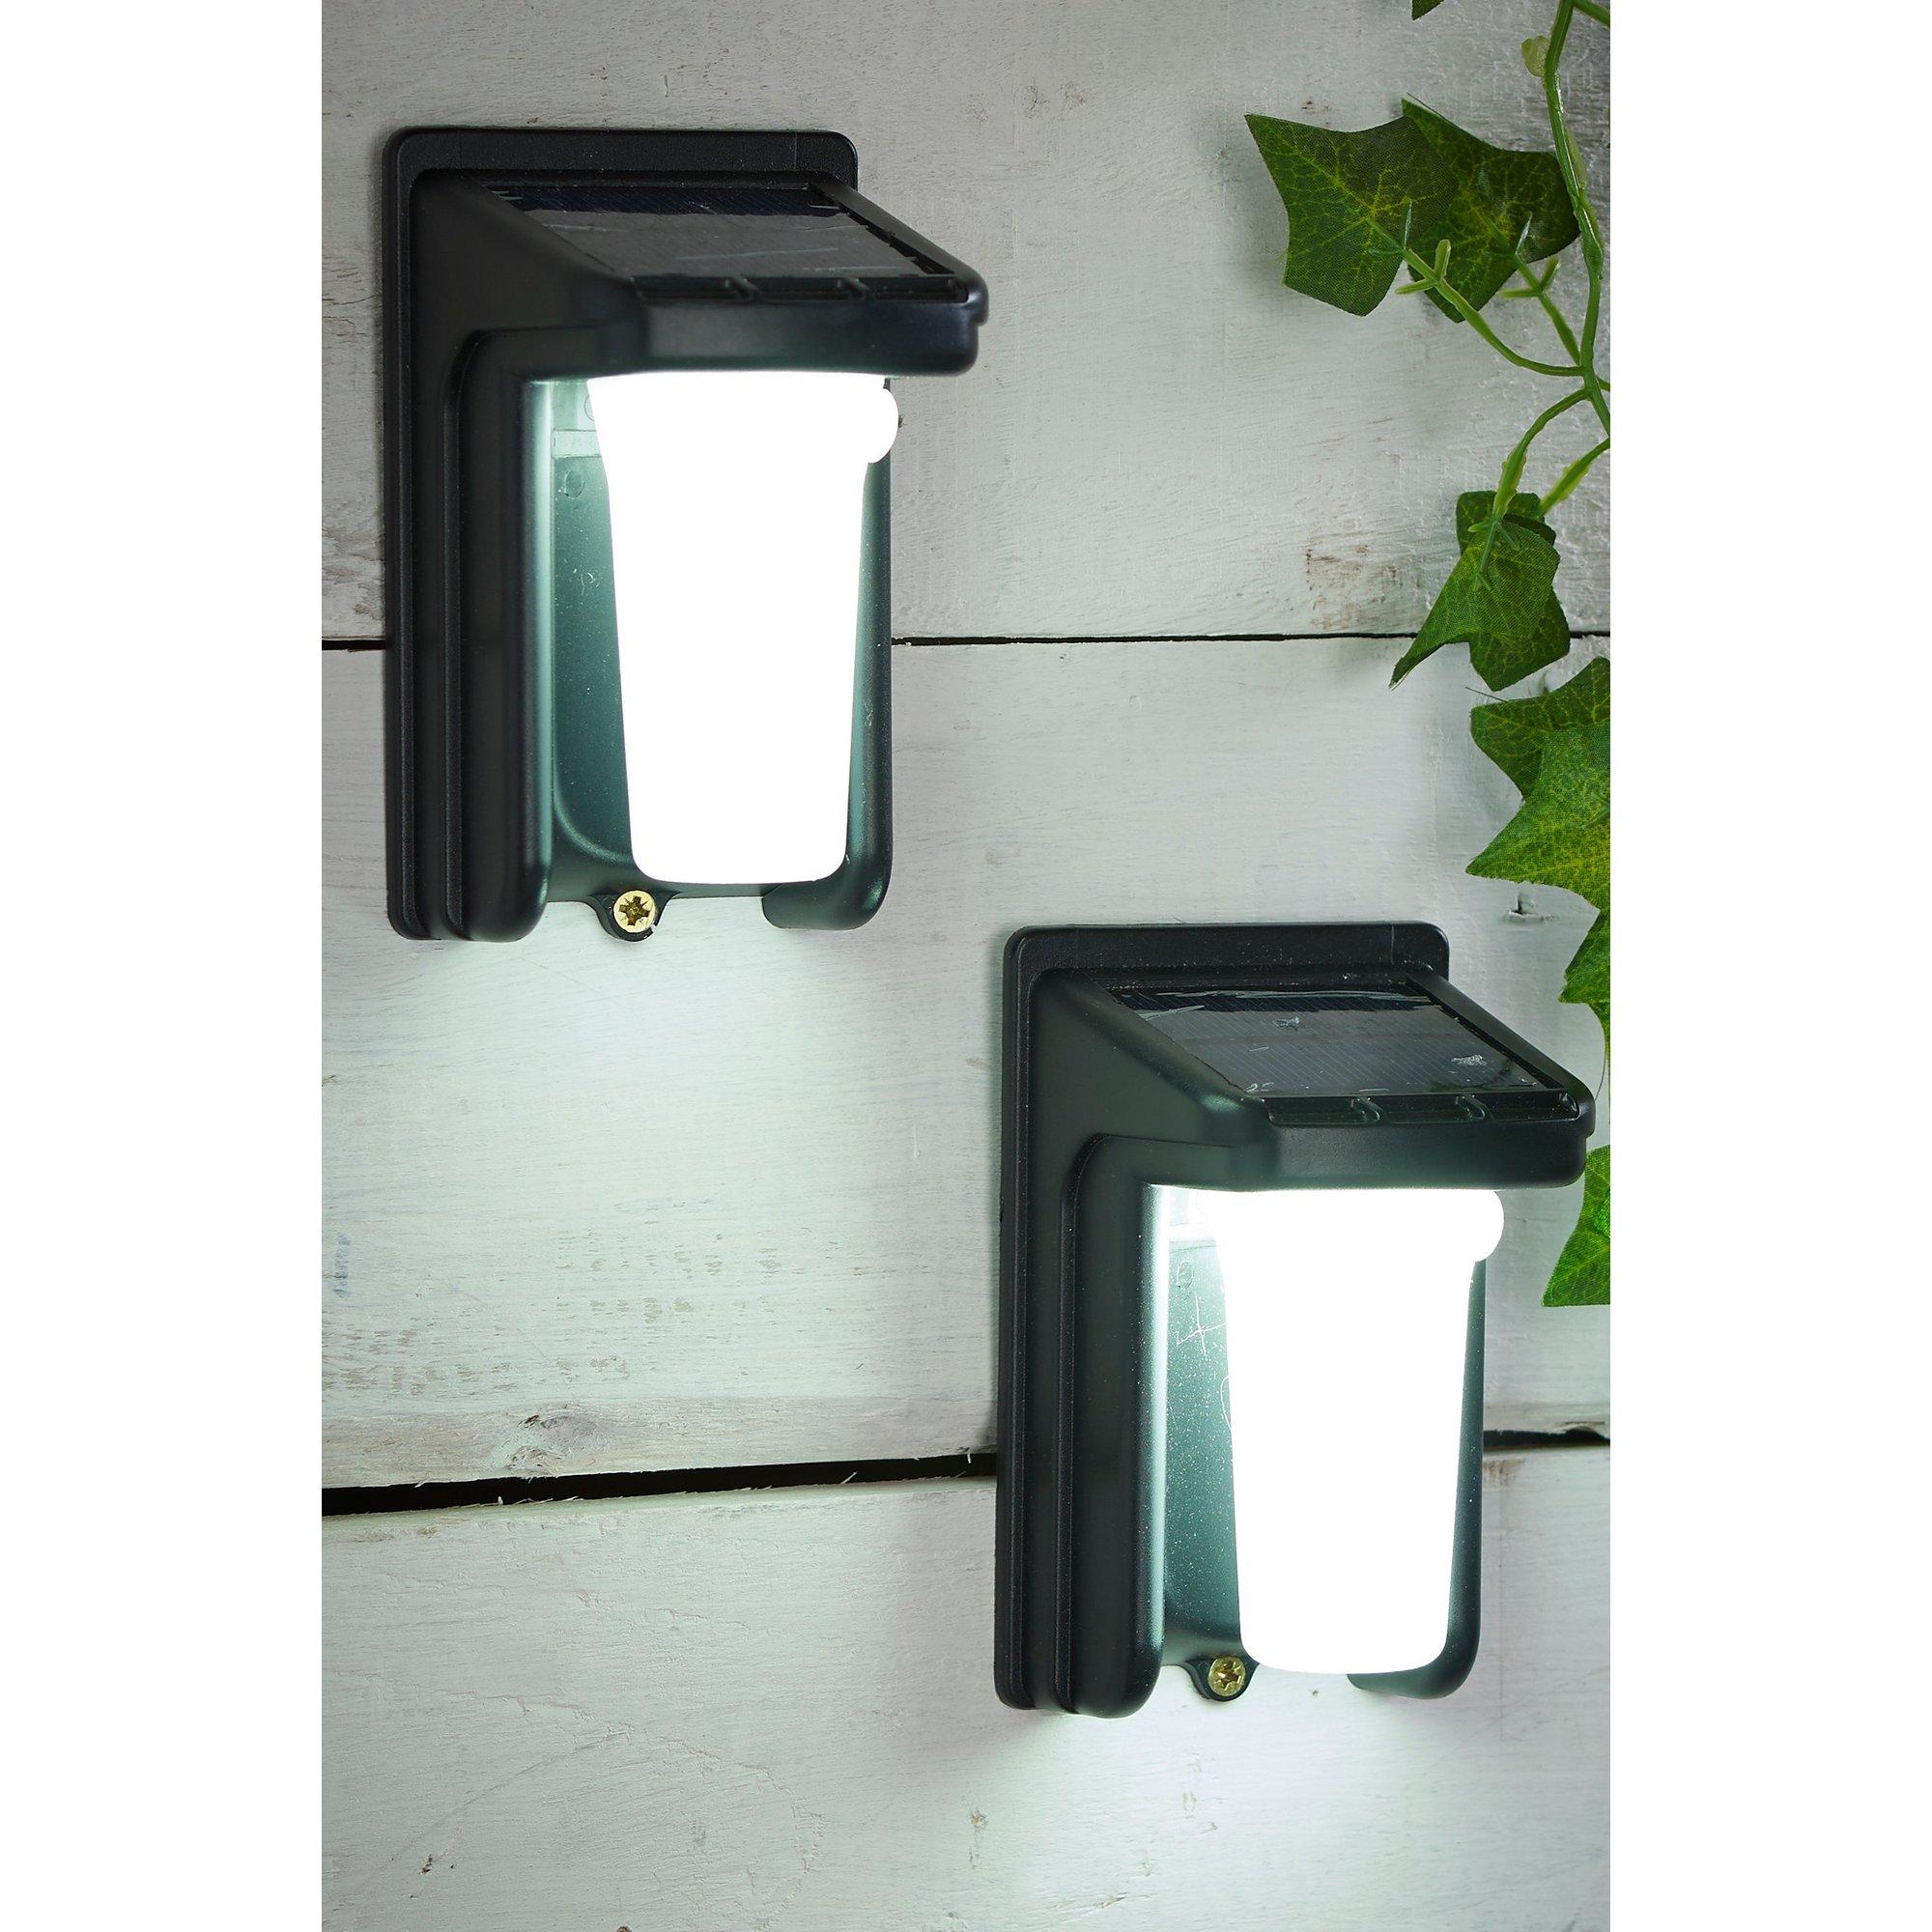 Image of Pair of Solar PIR Security Lights